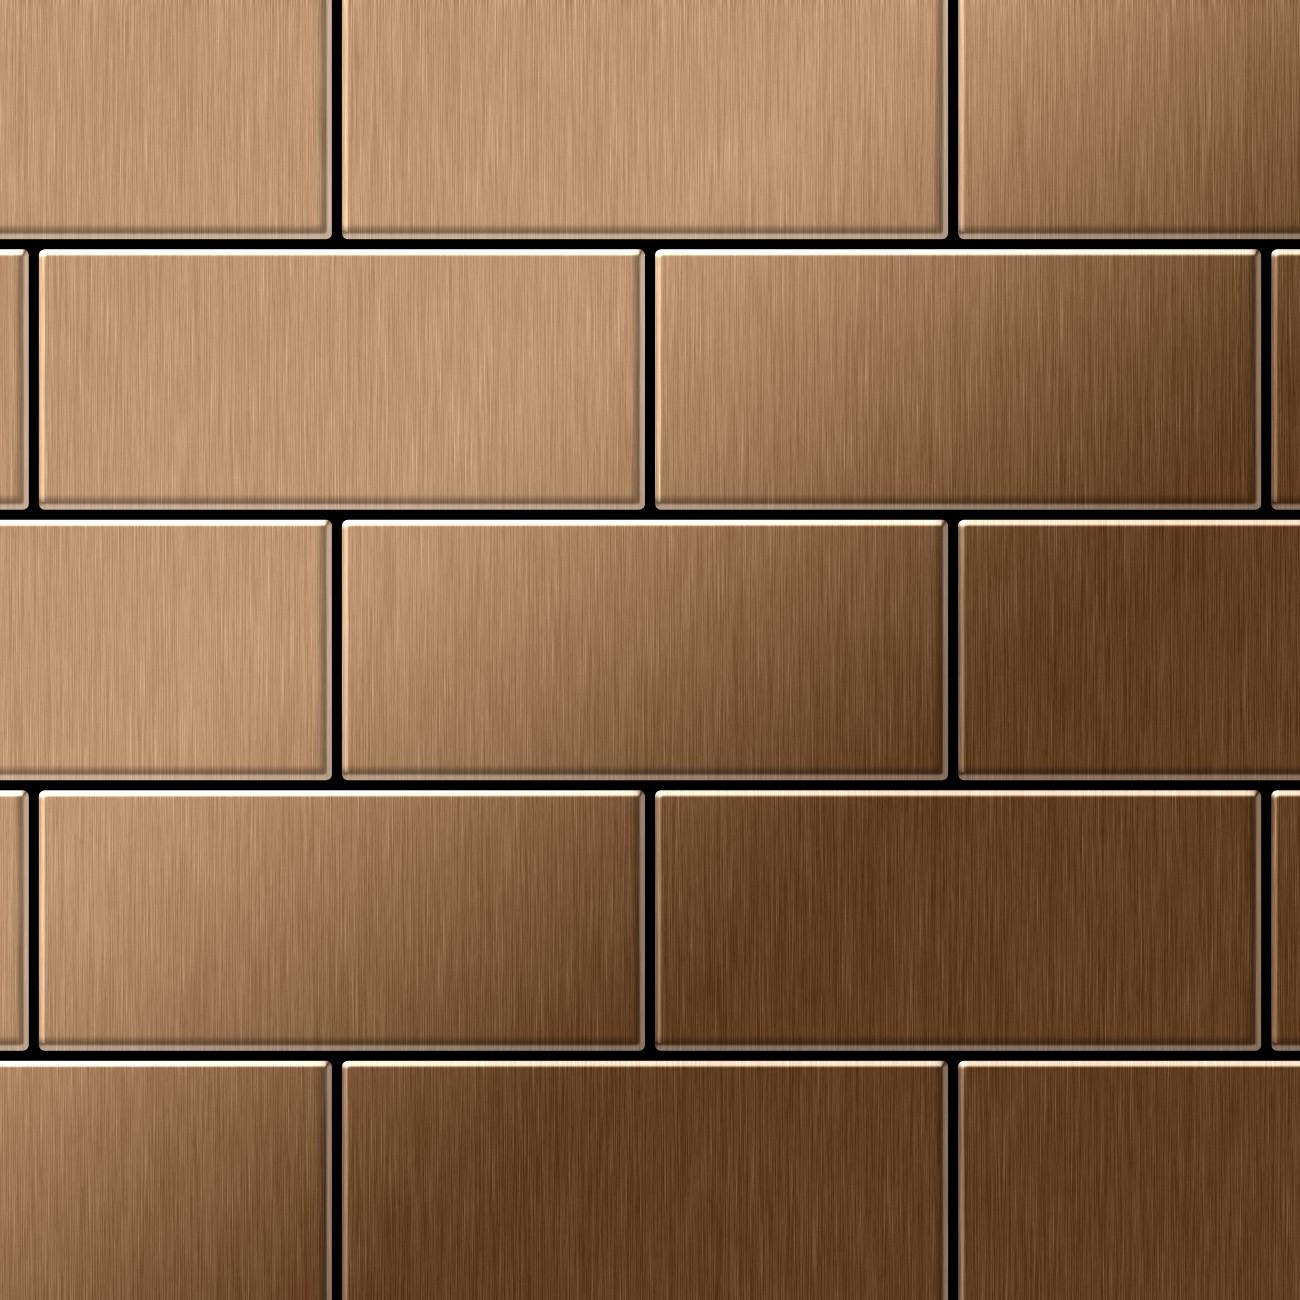 mosaik fliese massiv metall titan geb rstet in kupfer 1 6mm stark alloy subway ti ab 0 58 m2. Black Bedroom Furniture Sets. Home Design Ideas